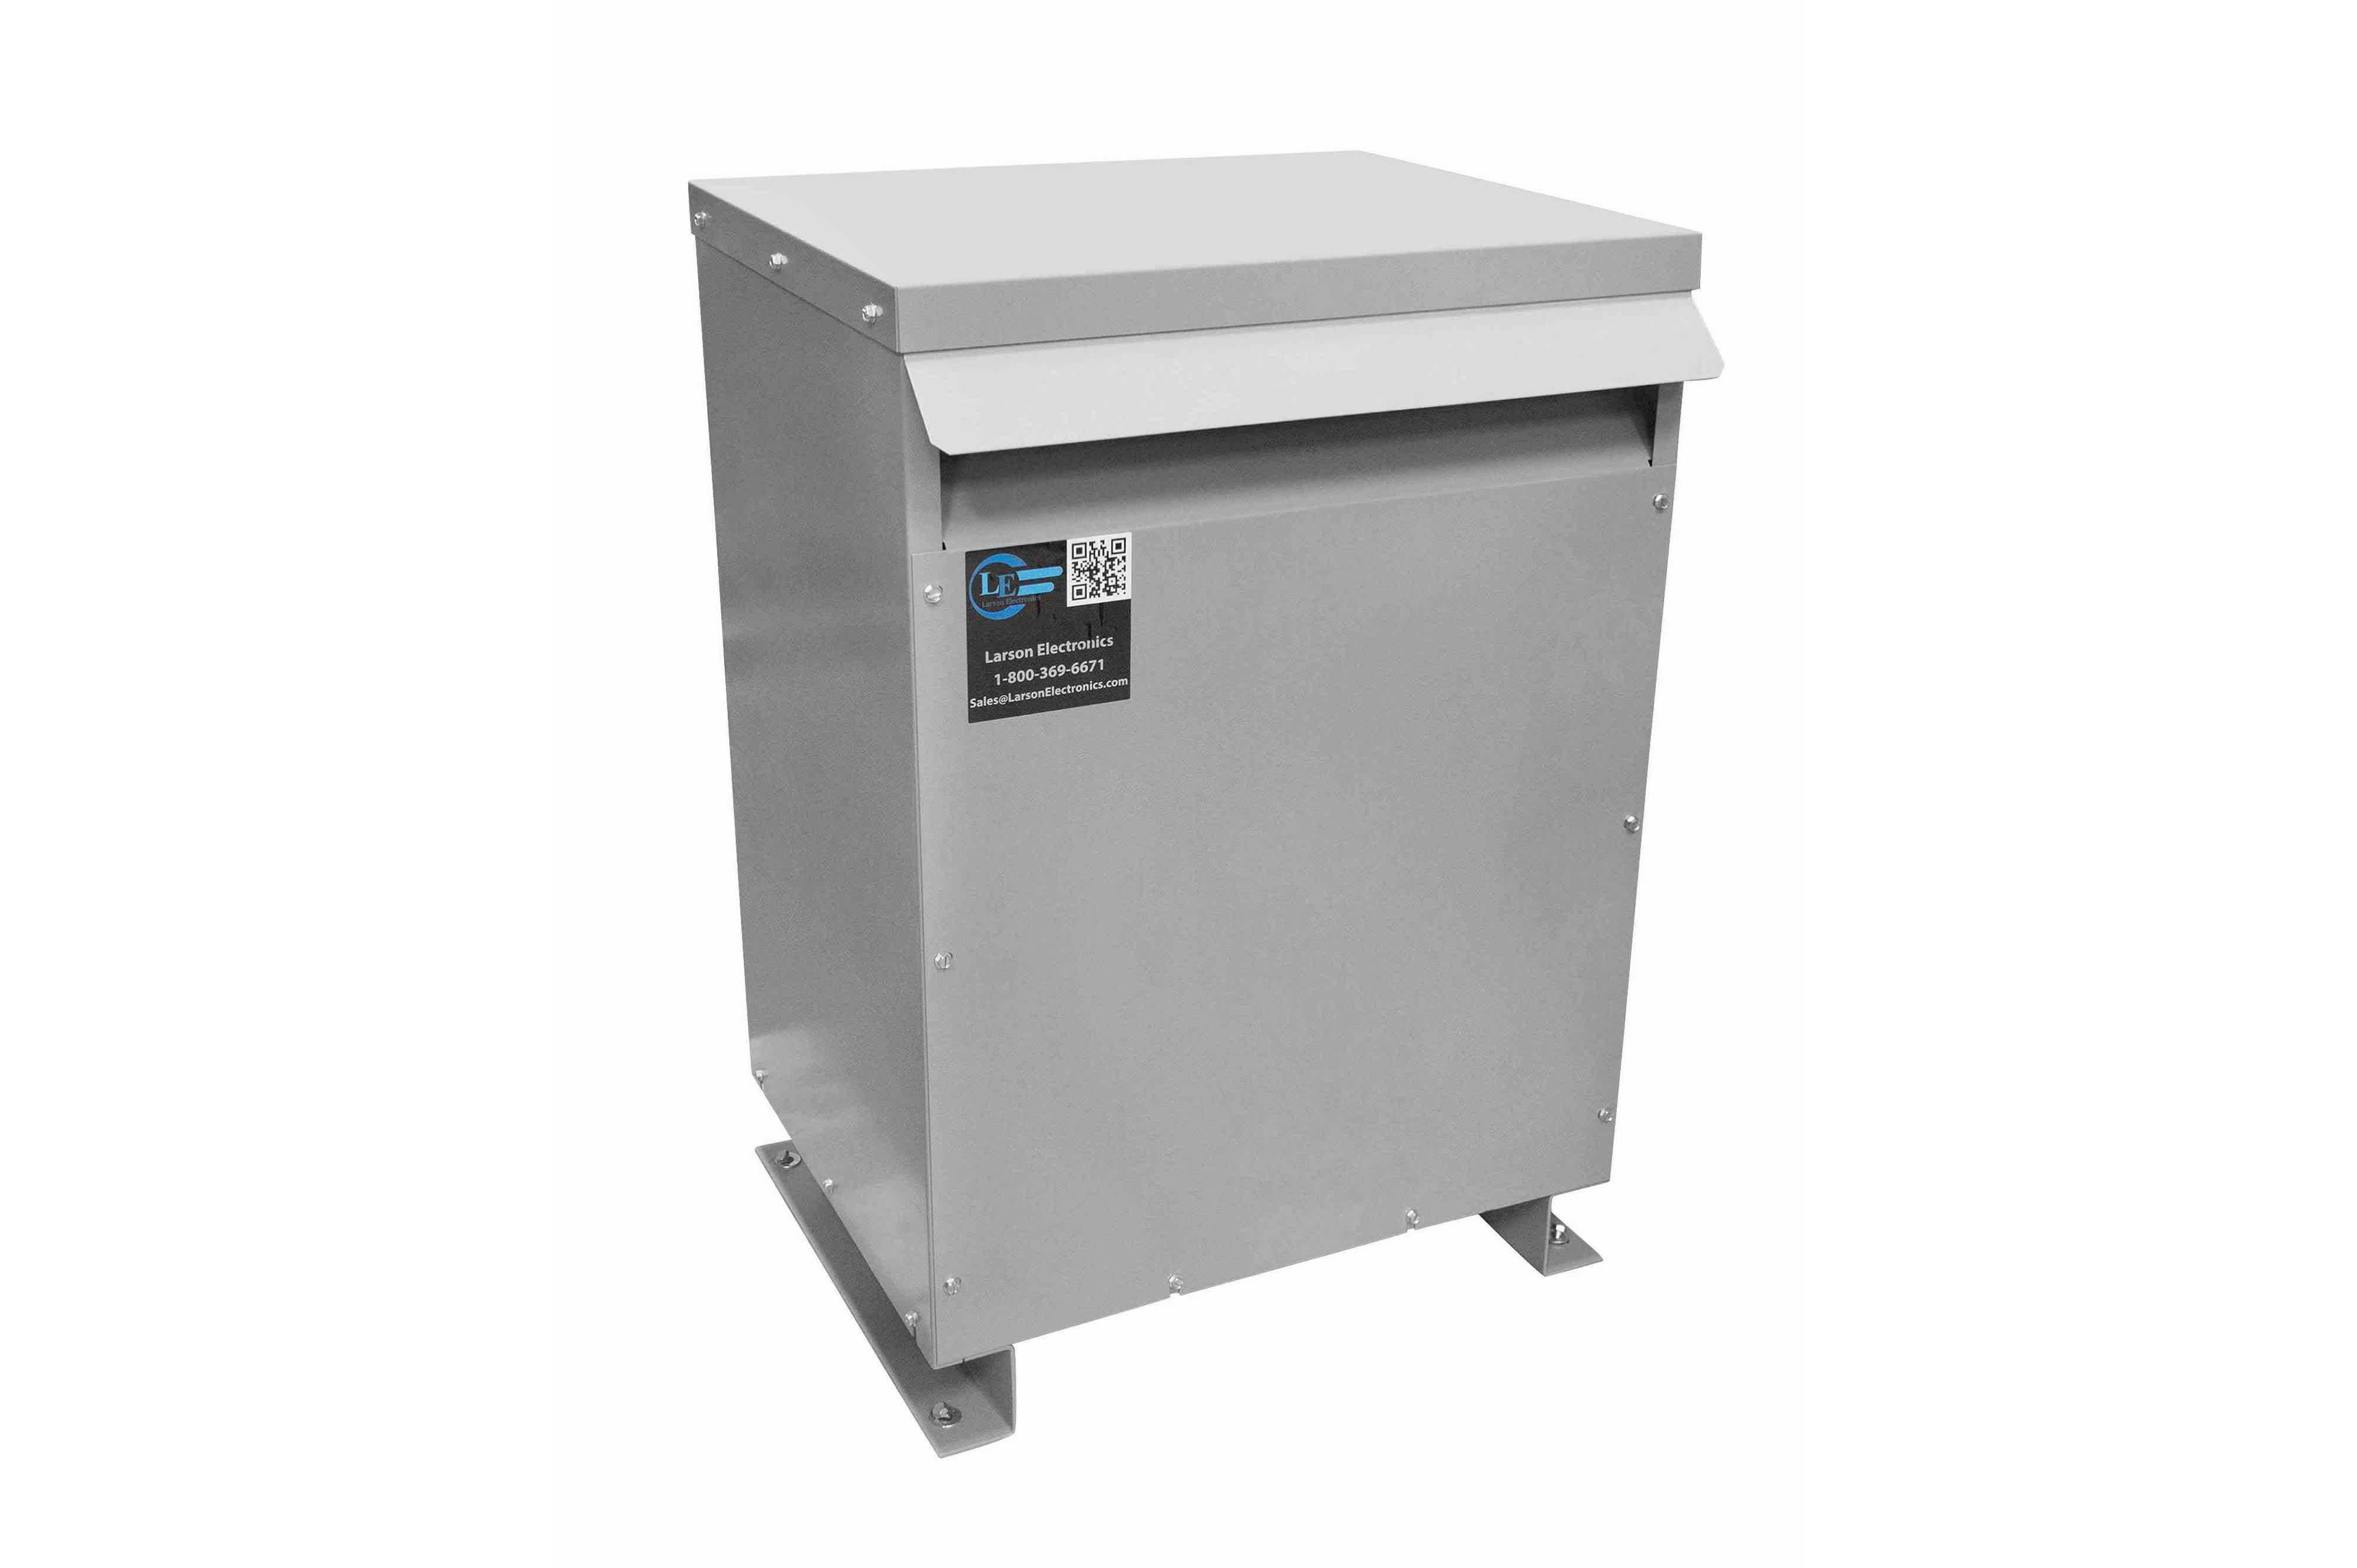 50 kVA 3PH DOE Transformer, 230V Delta Primary, 480Y/277 Wye-N Secondary, N3R, Ventilated, 60 Hz